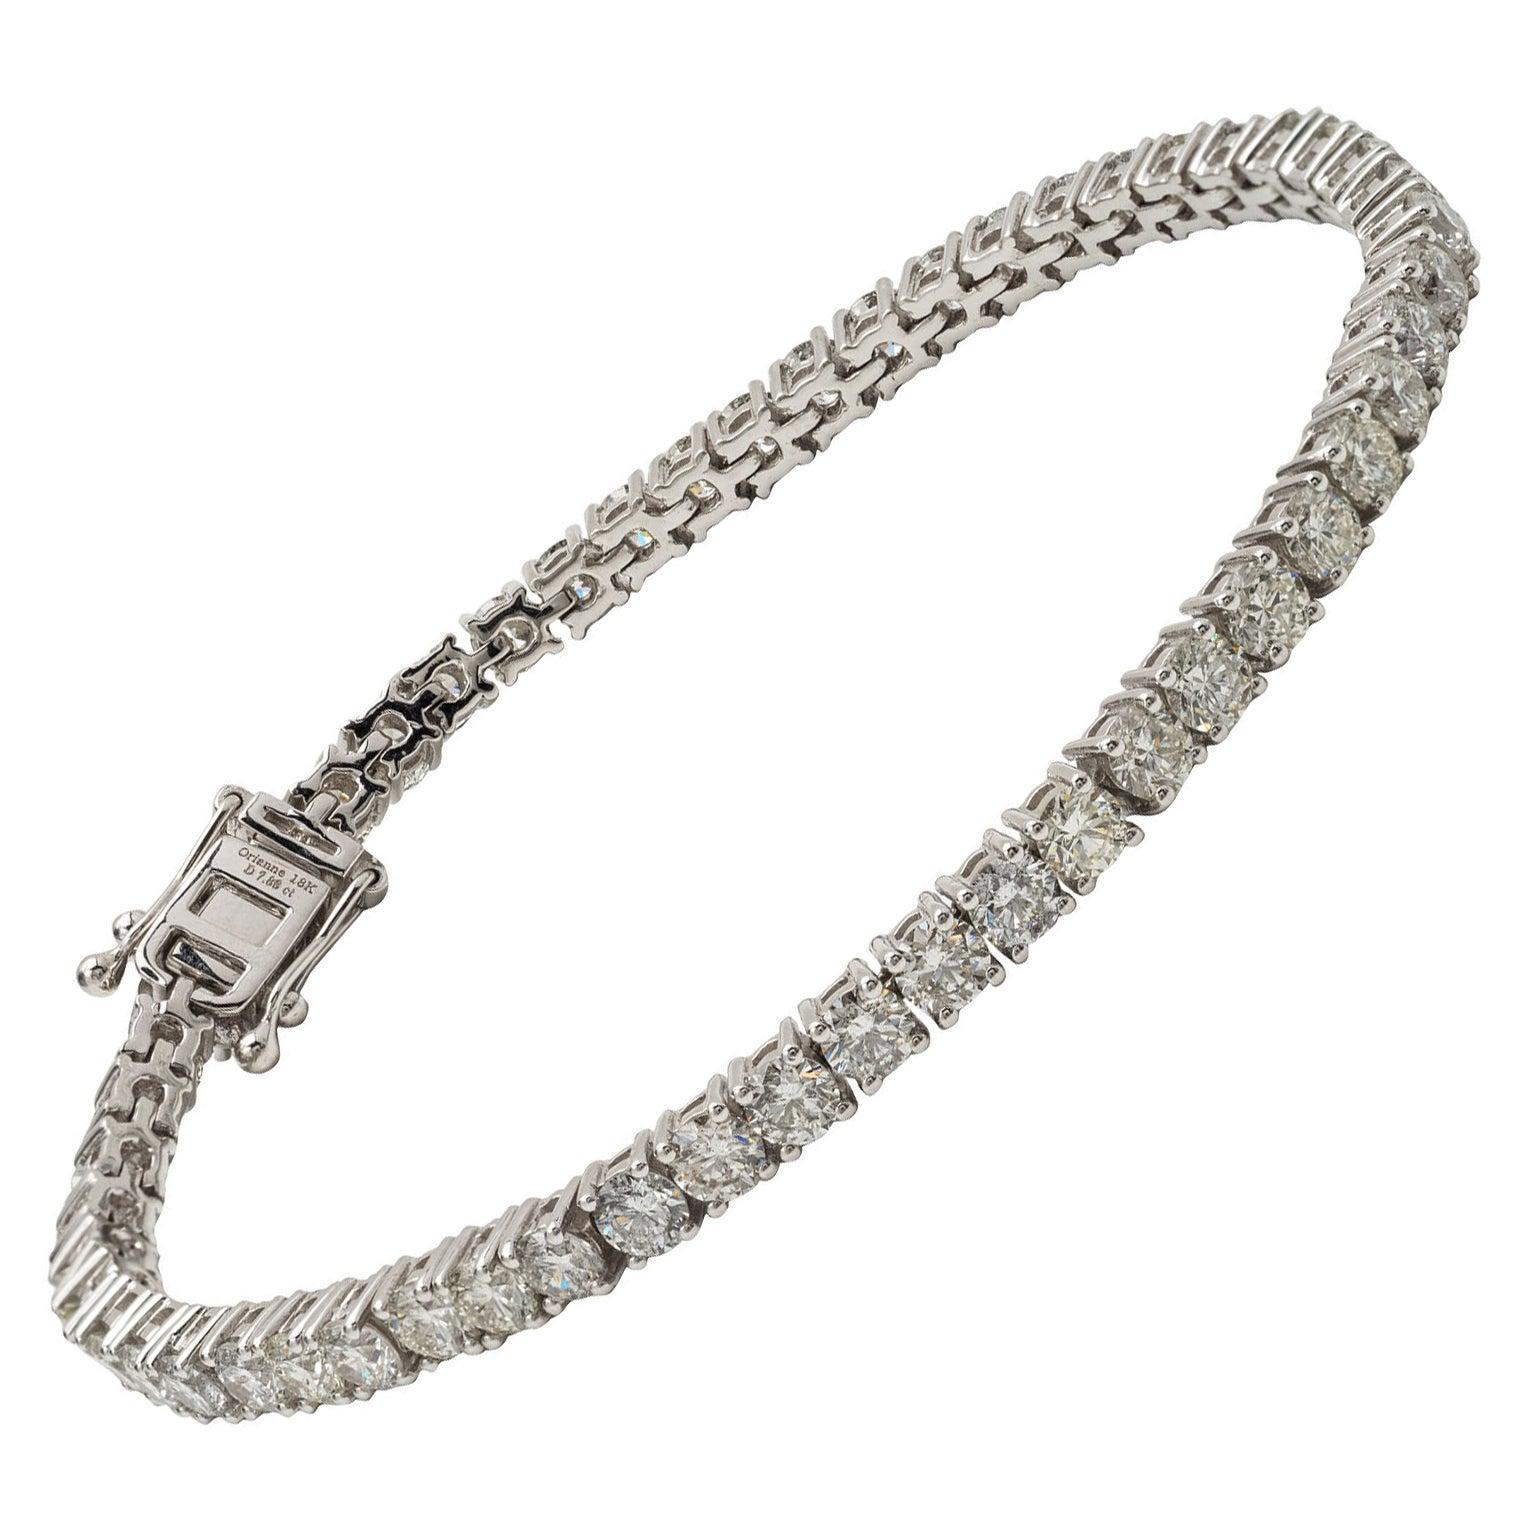 18KT Gold and Diamond Tennis Bracelet